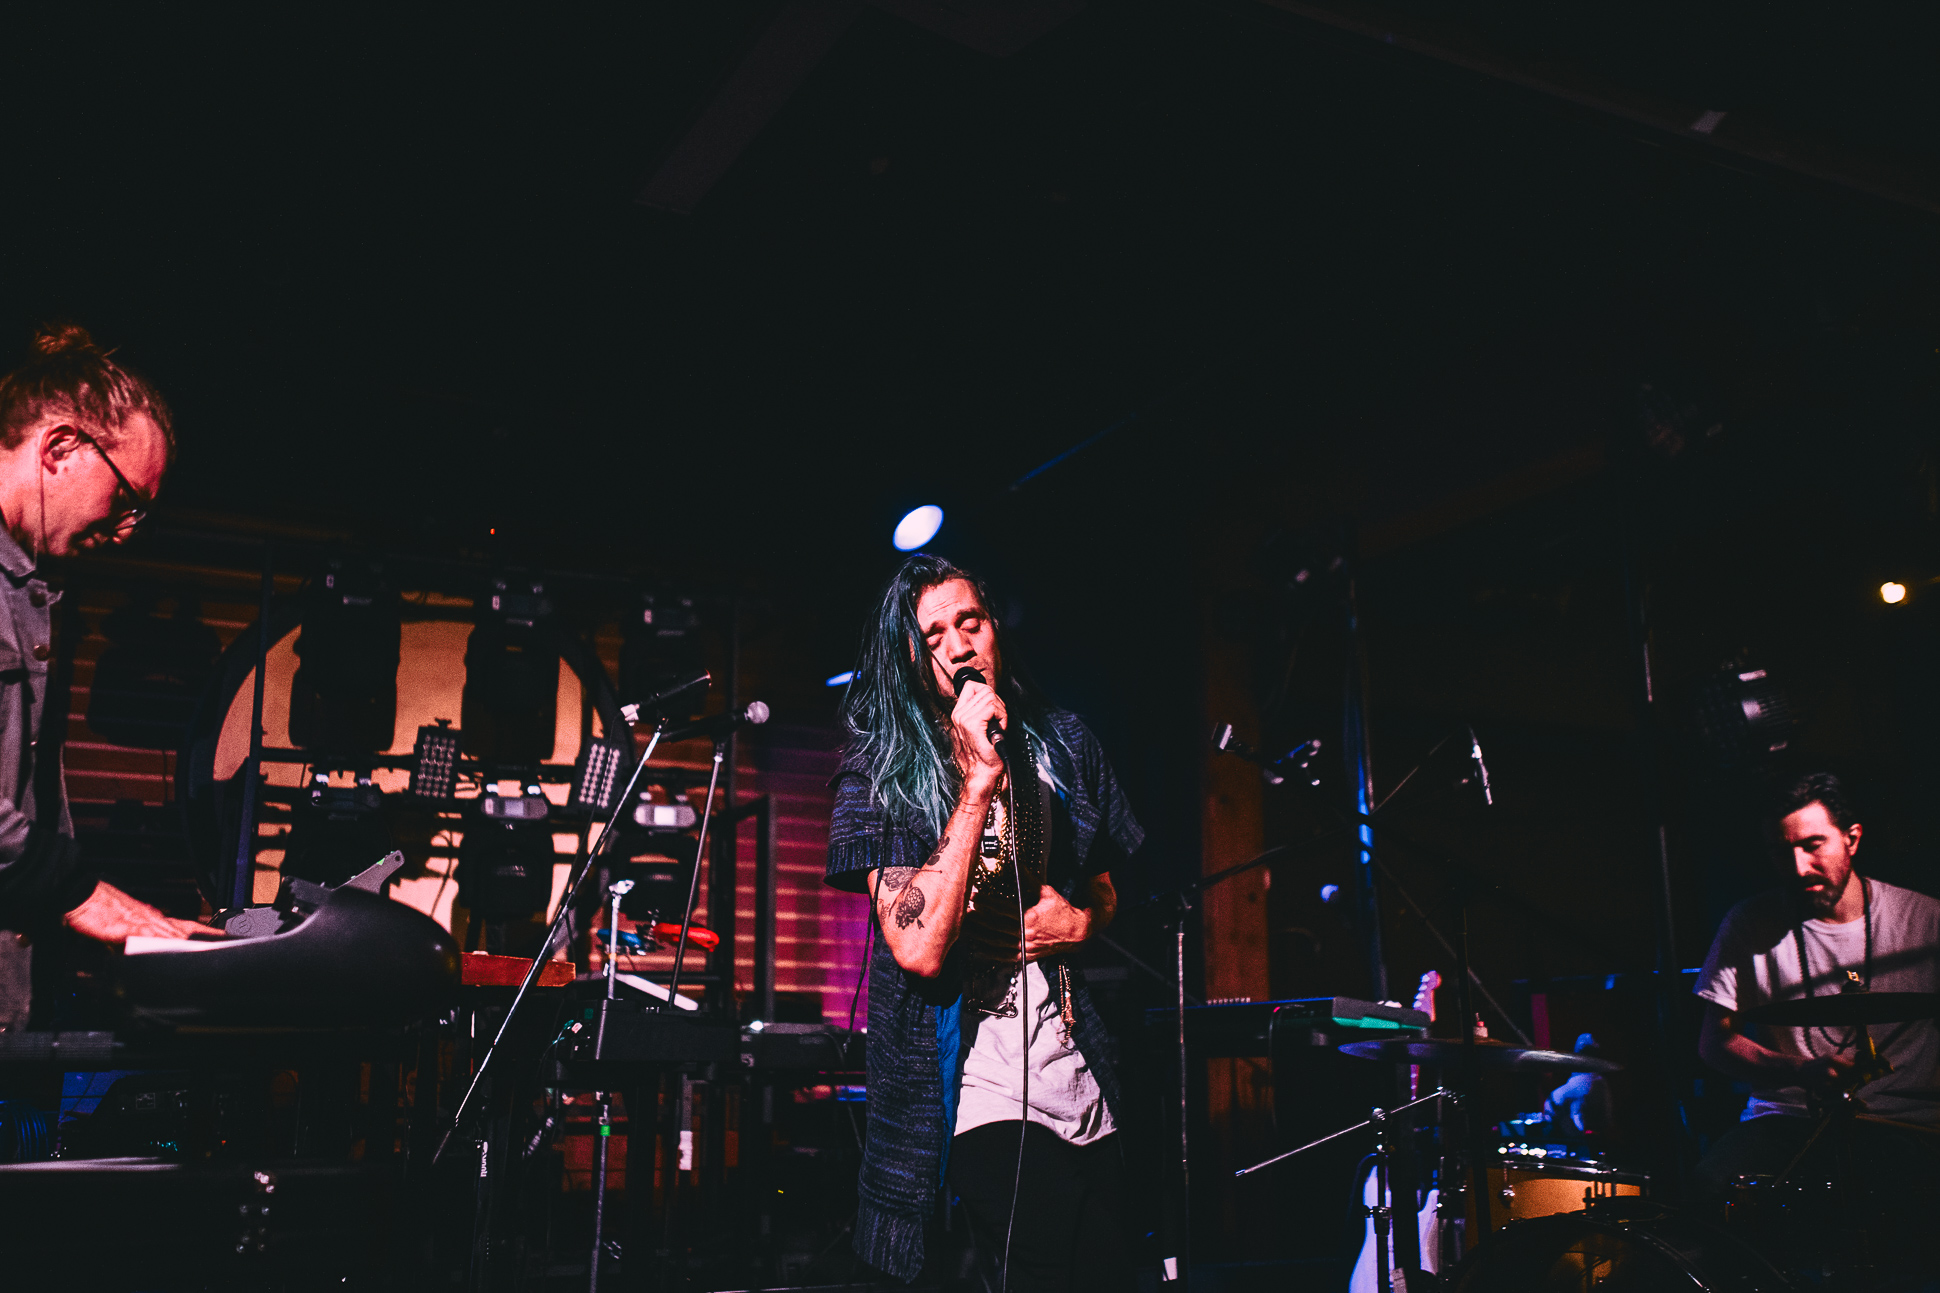 YoungAndSick-FortuneSoundClub-24-01-2019-Vancouver-16.jpg